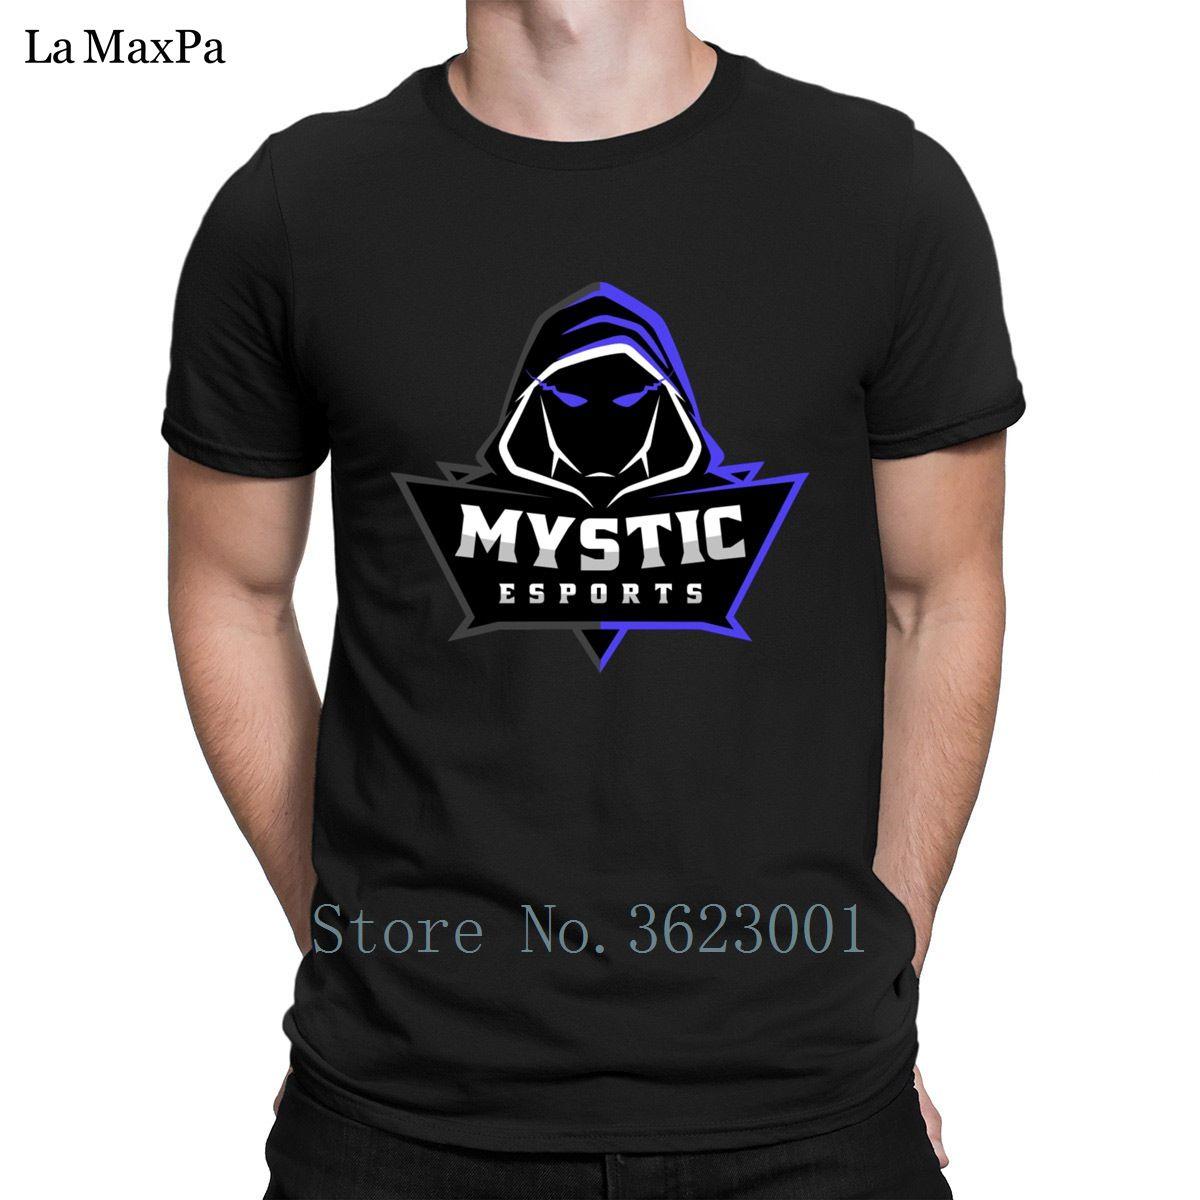 5c9458f6f The New Men S Tee Shirt Mystic Esports Logo Purple T Shirt For Men Sunlight  T Shirt Man Natural Tshirt S 3xl Tee Tops Best Funny T Shirts Really Cool T  ...